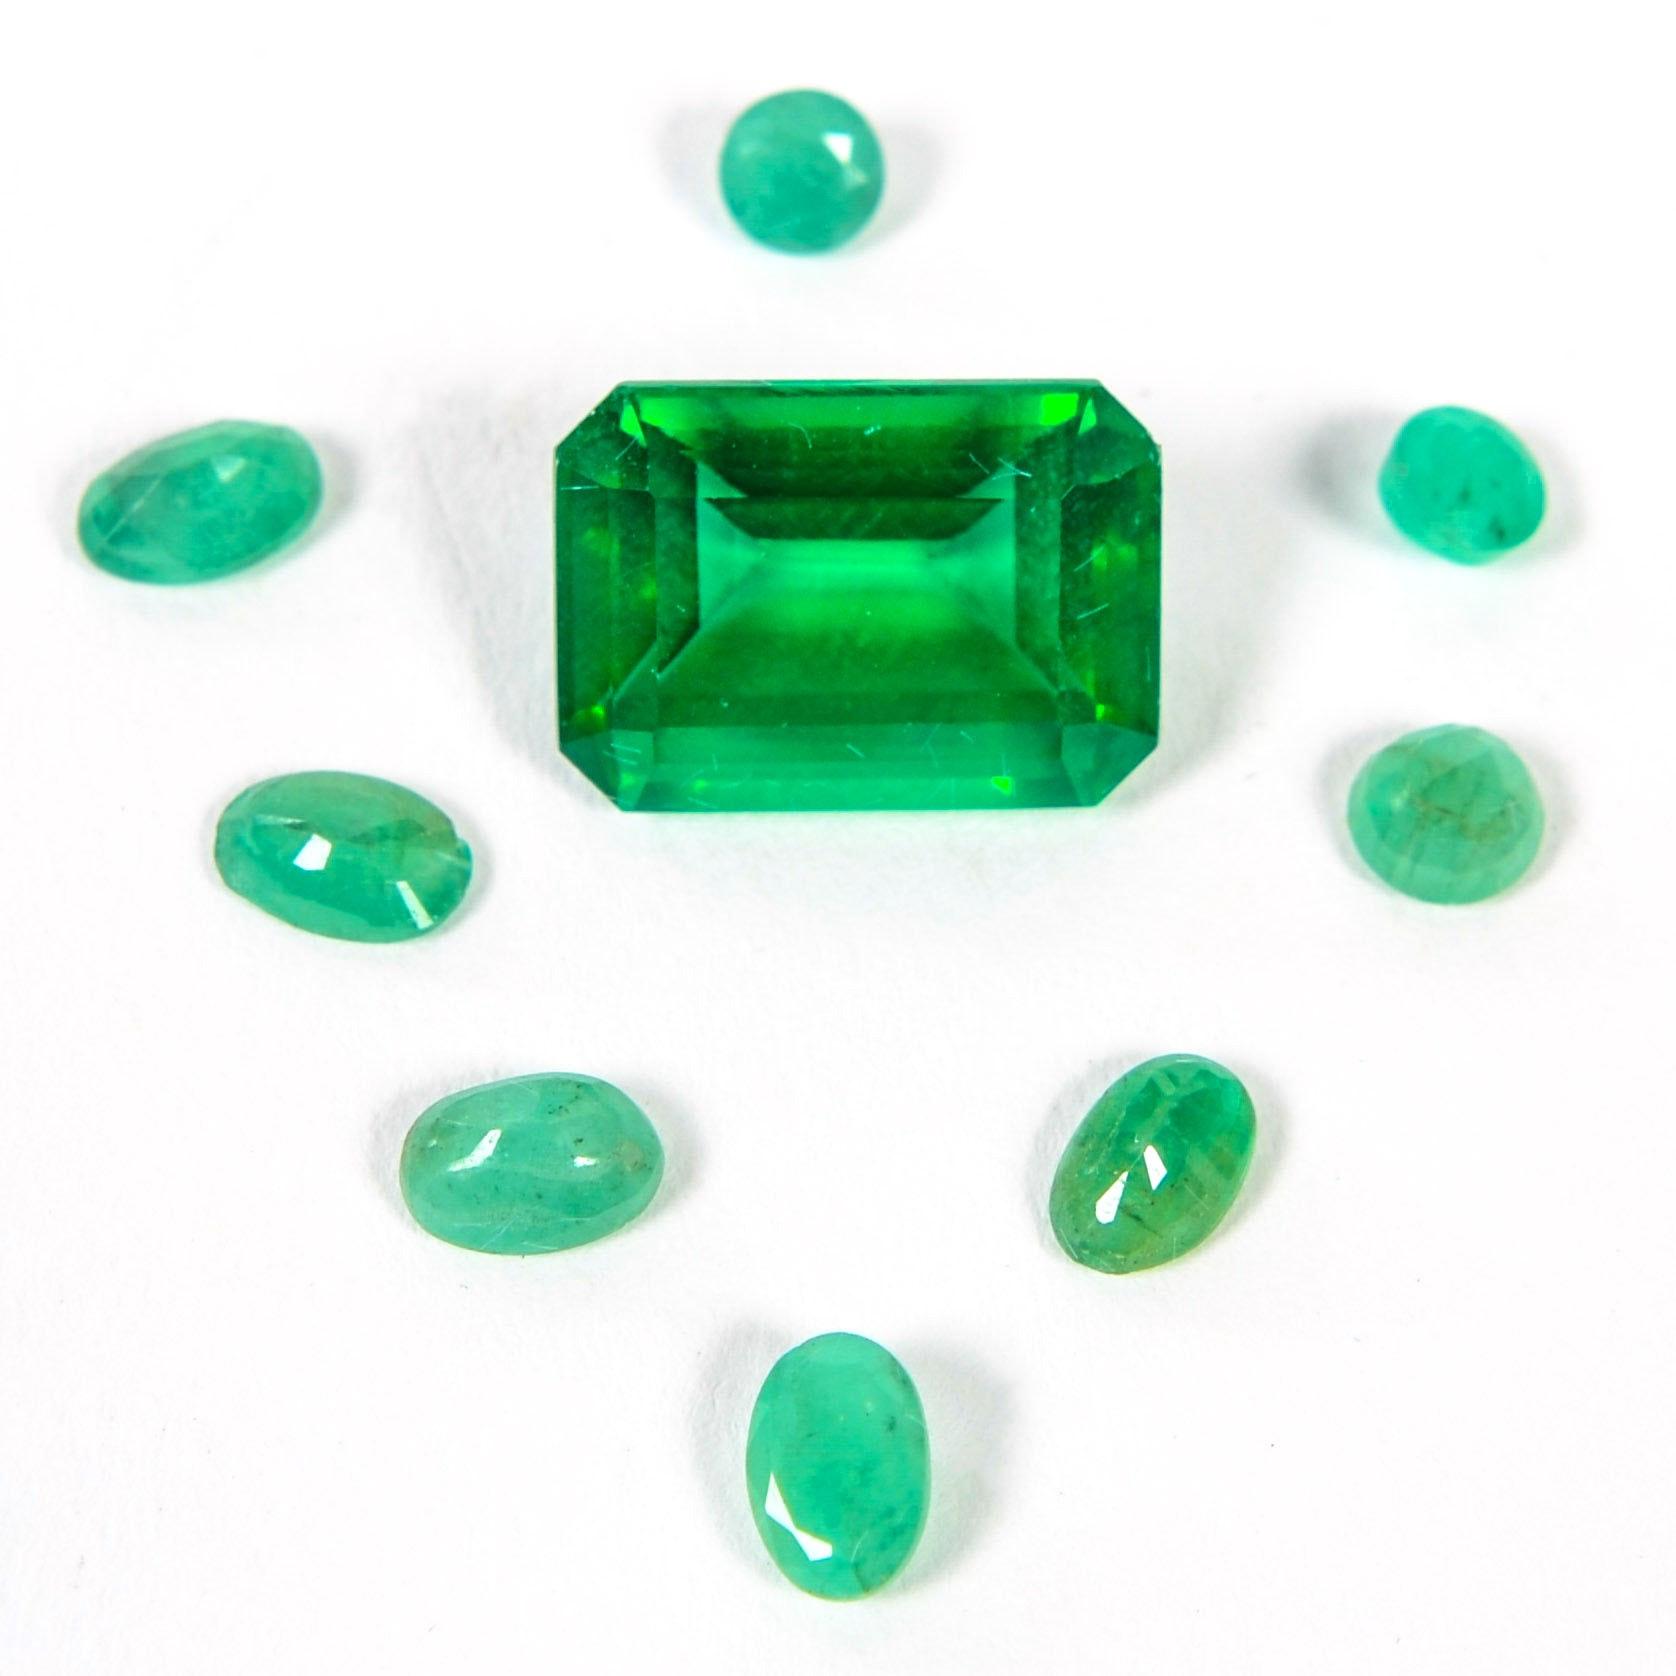 Collection of Loose Grossular Garnet and Emerald Gemstones